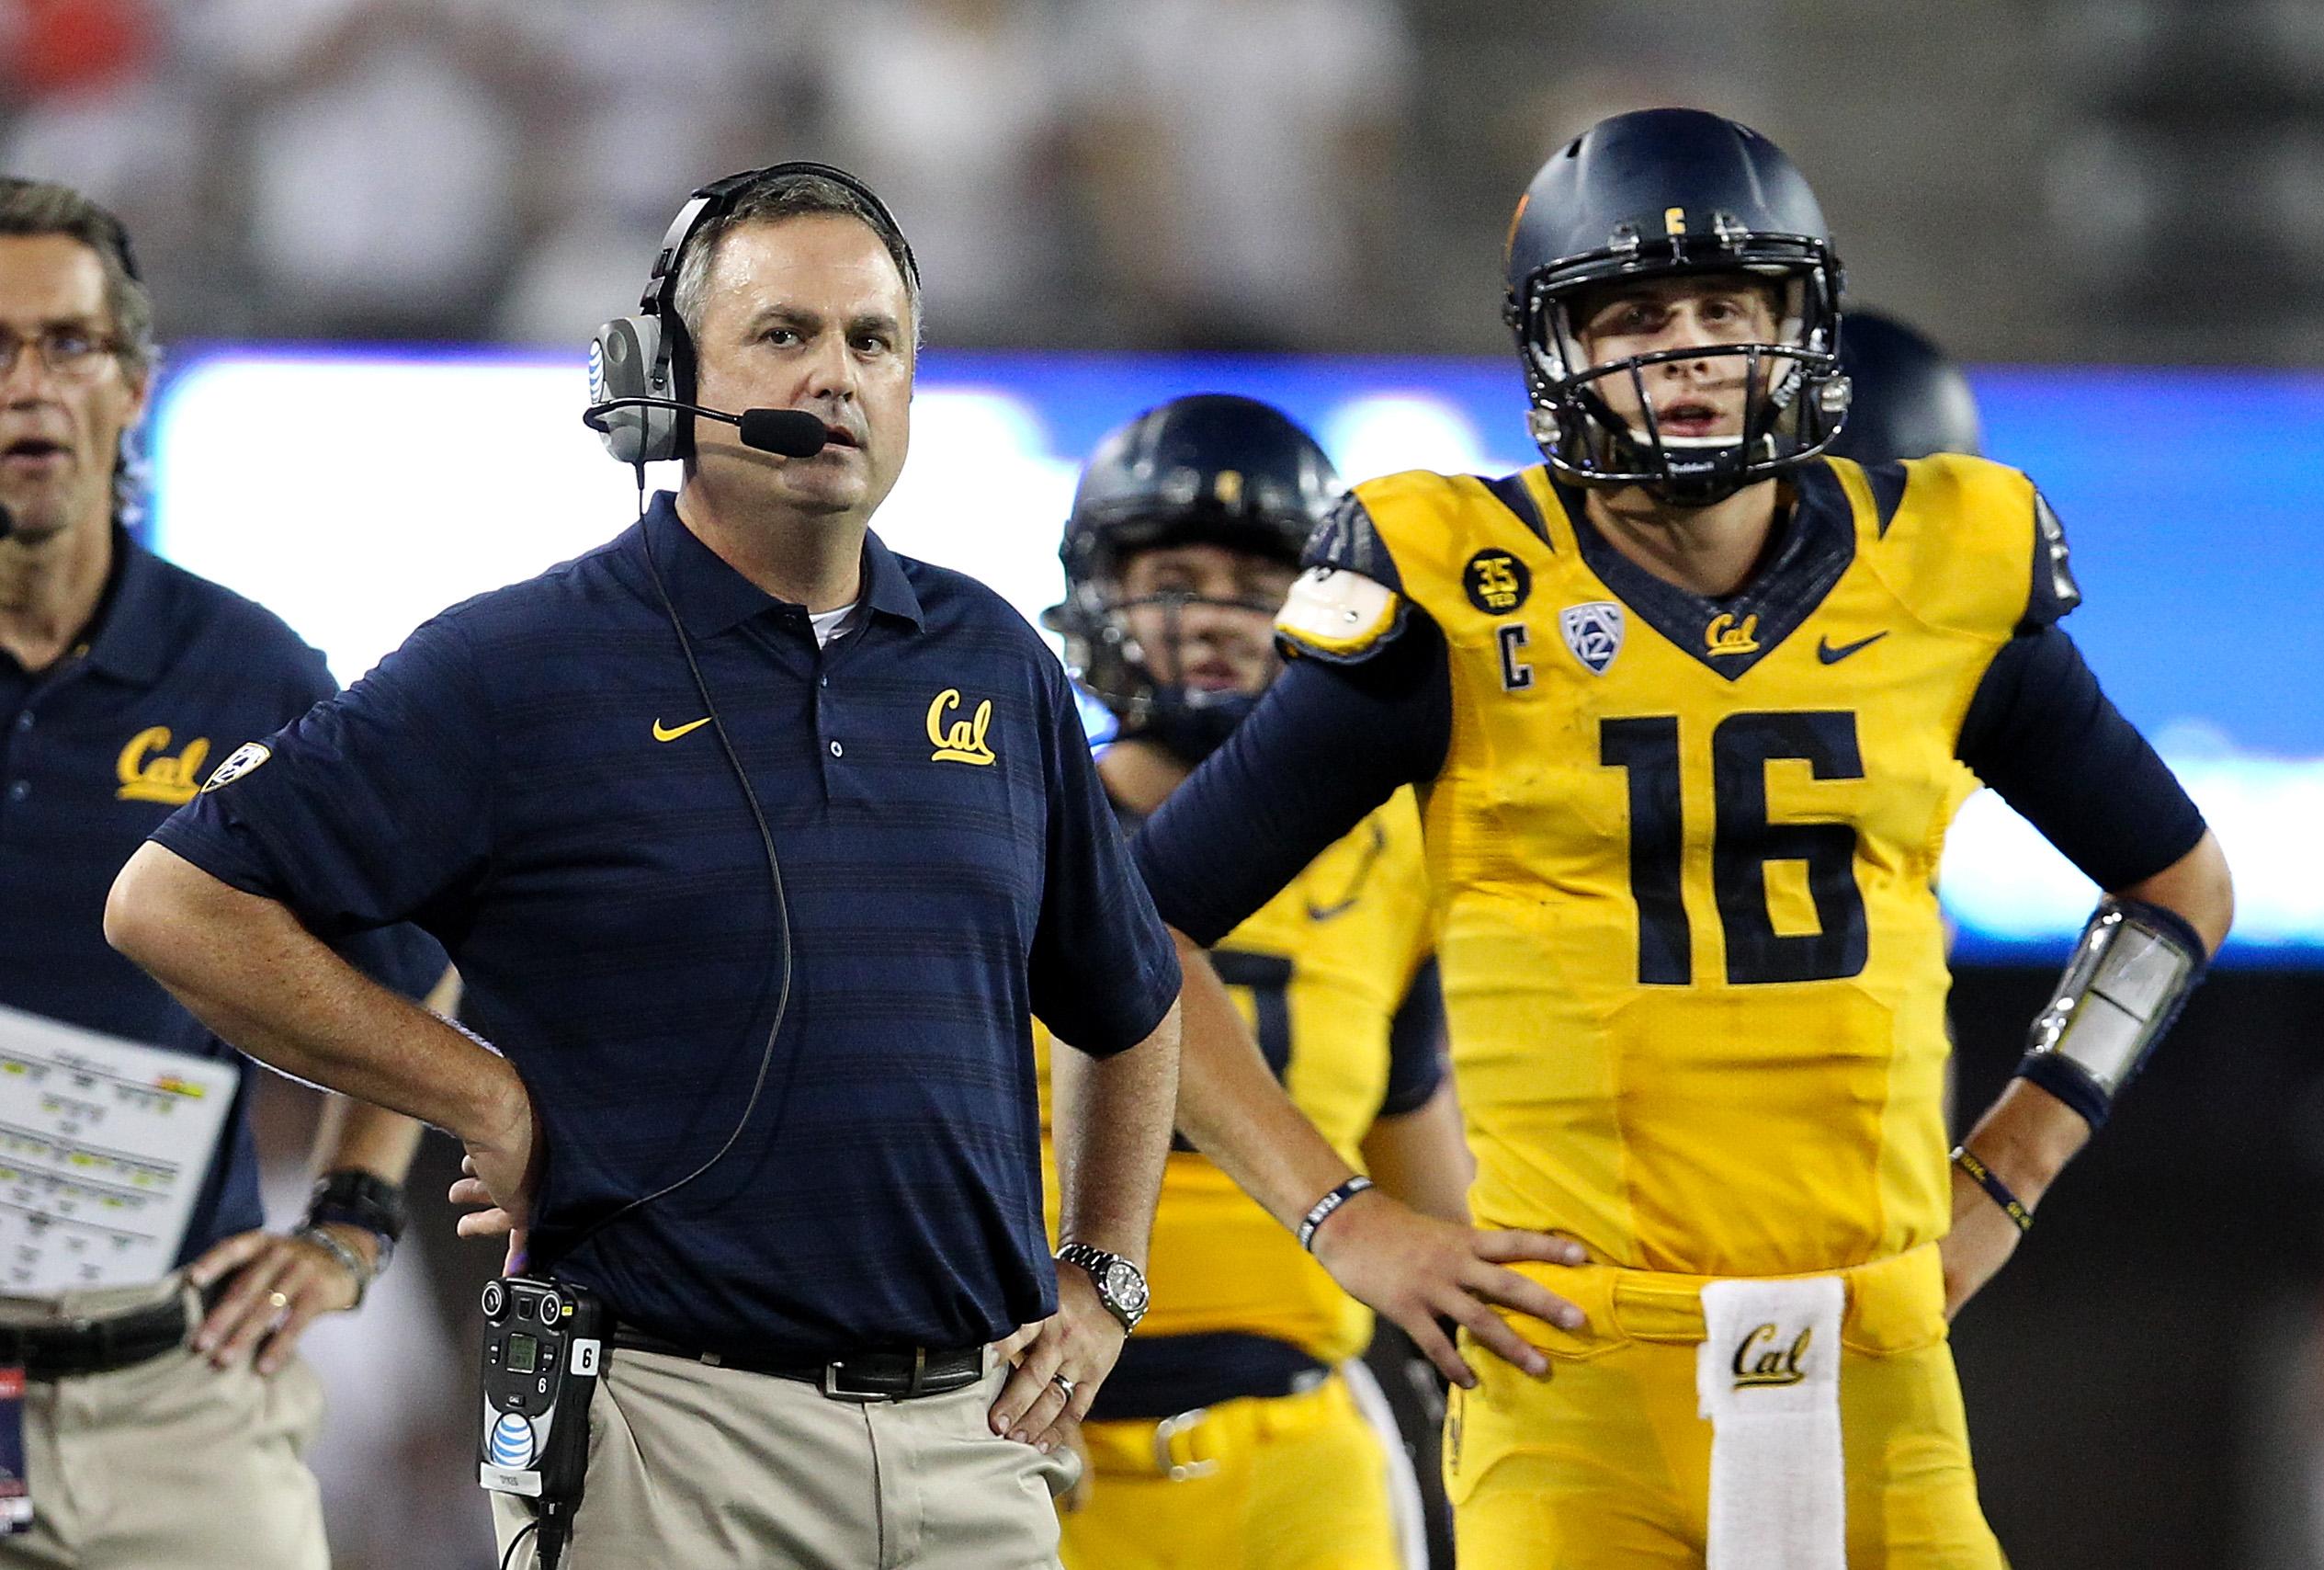 University of California fires football coach Sonny Dykes